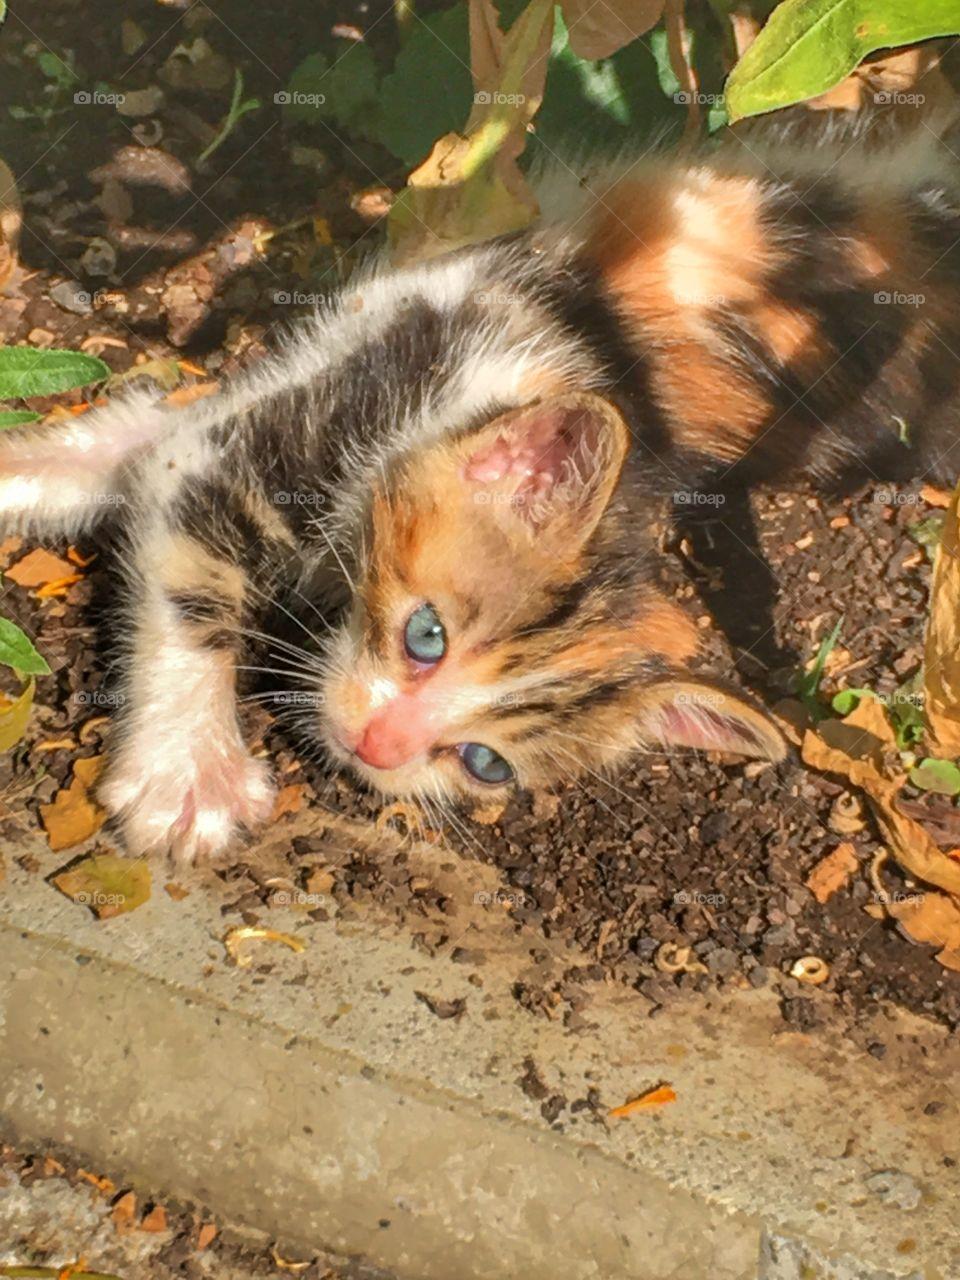 Adorable Small kitten